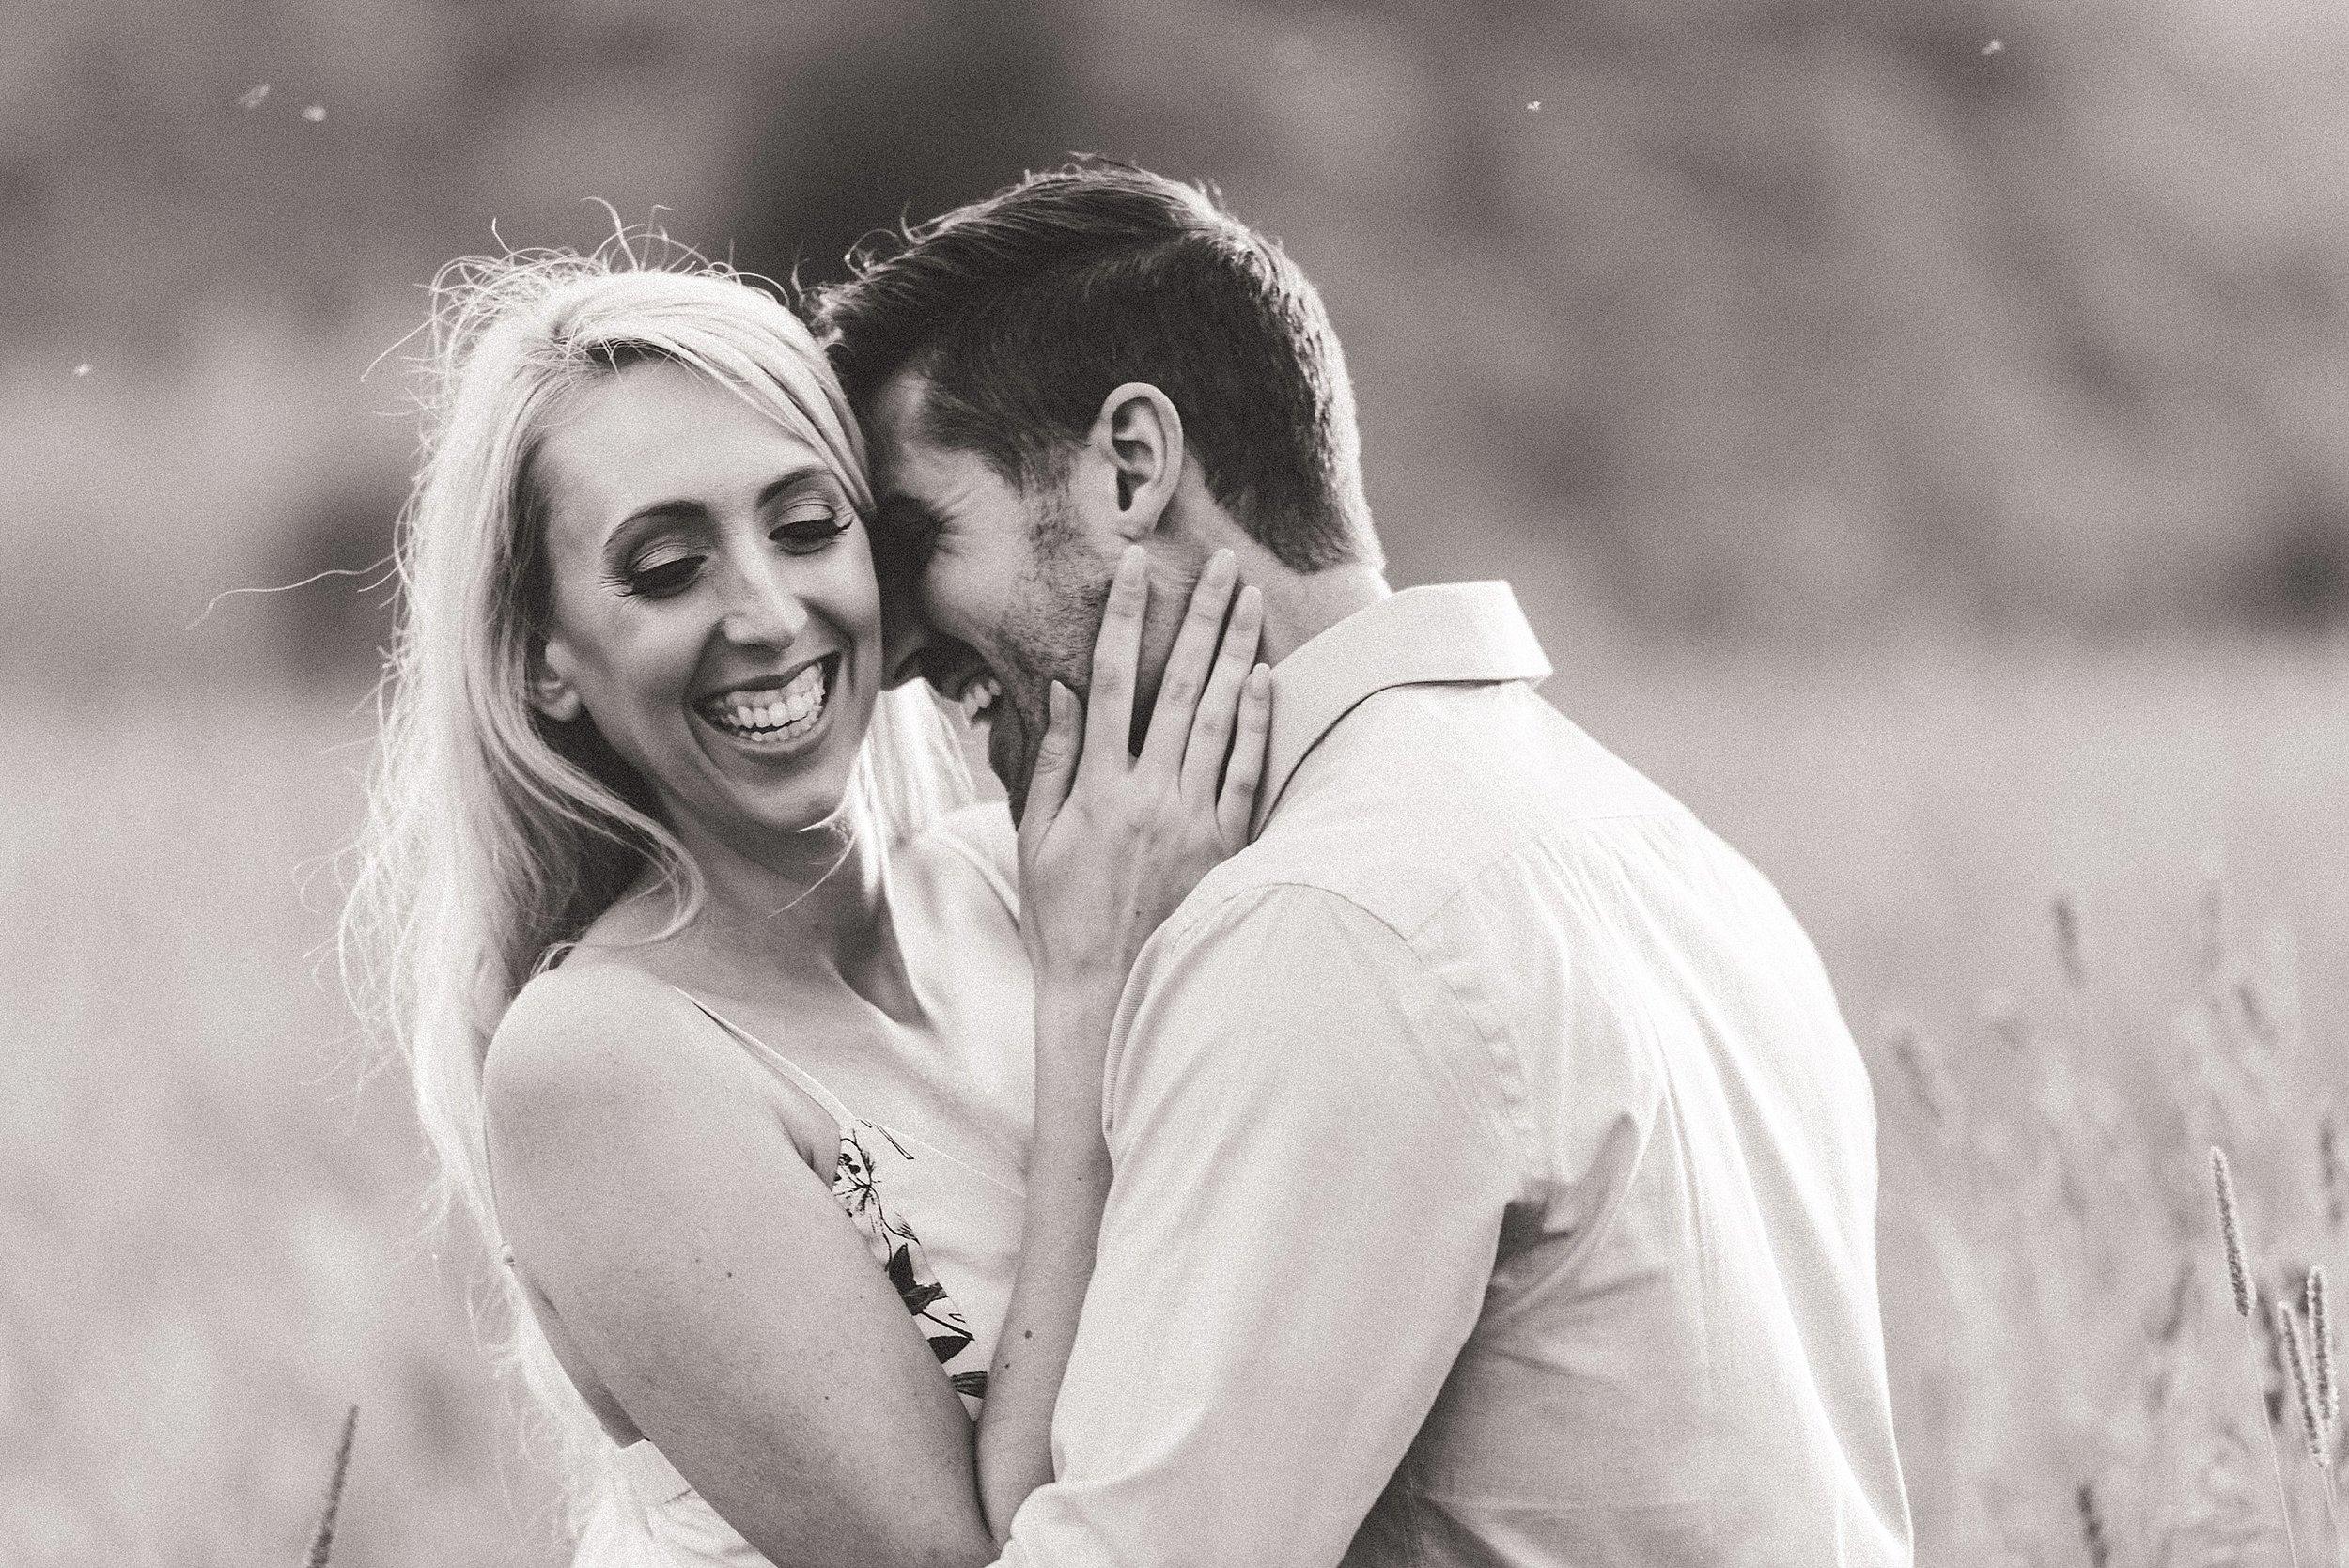 Ali and Batoul Photography - light, airy, indie documentary Ottawa wedding photographer_0049.jpg